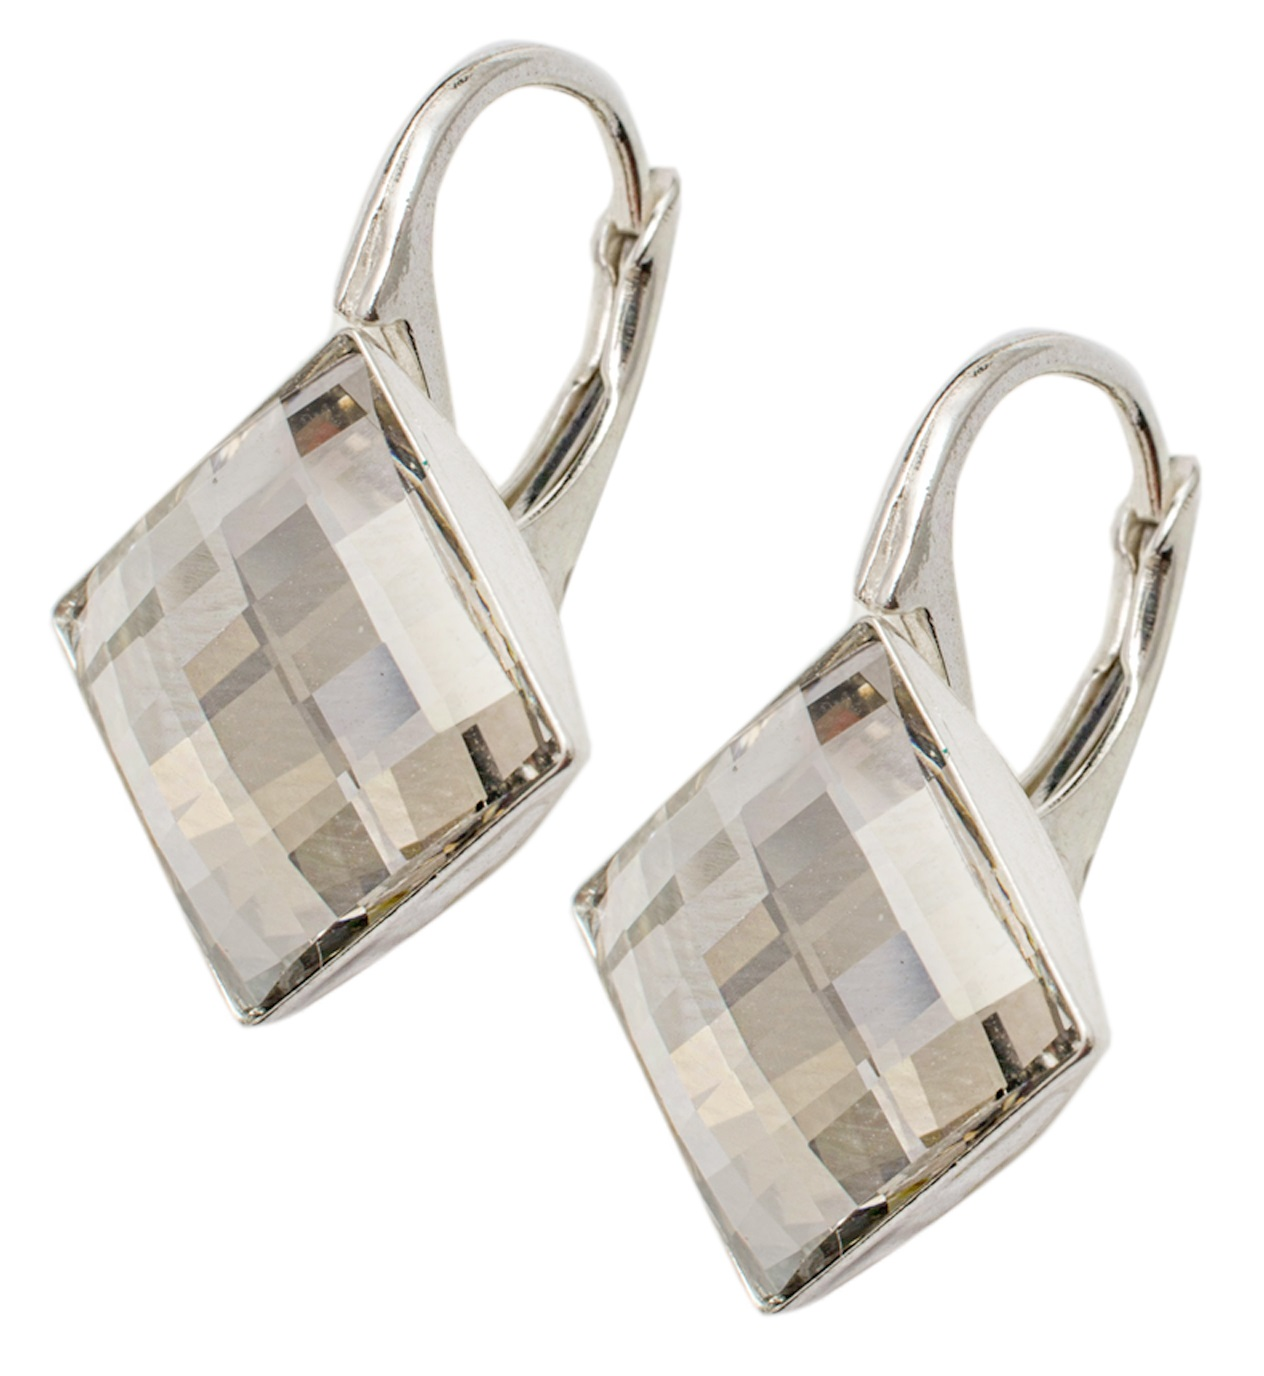 Cercei Argint Cu Swarovski Elements BeSpecialro